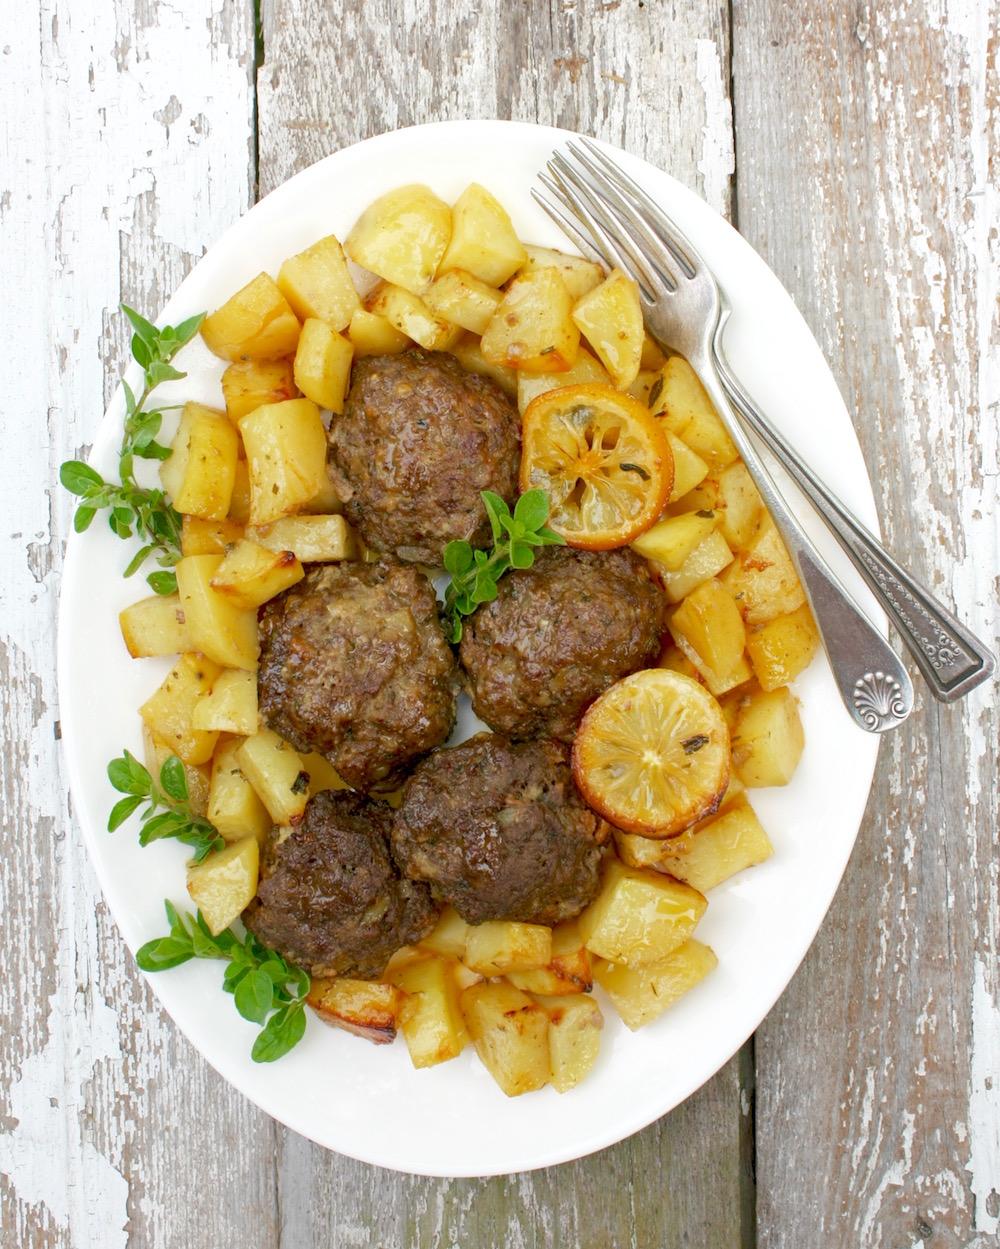 traditional Greek meatballs